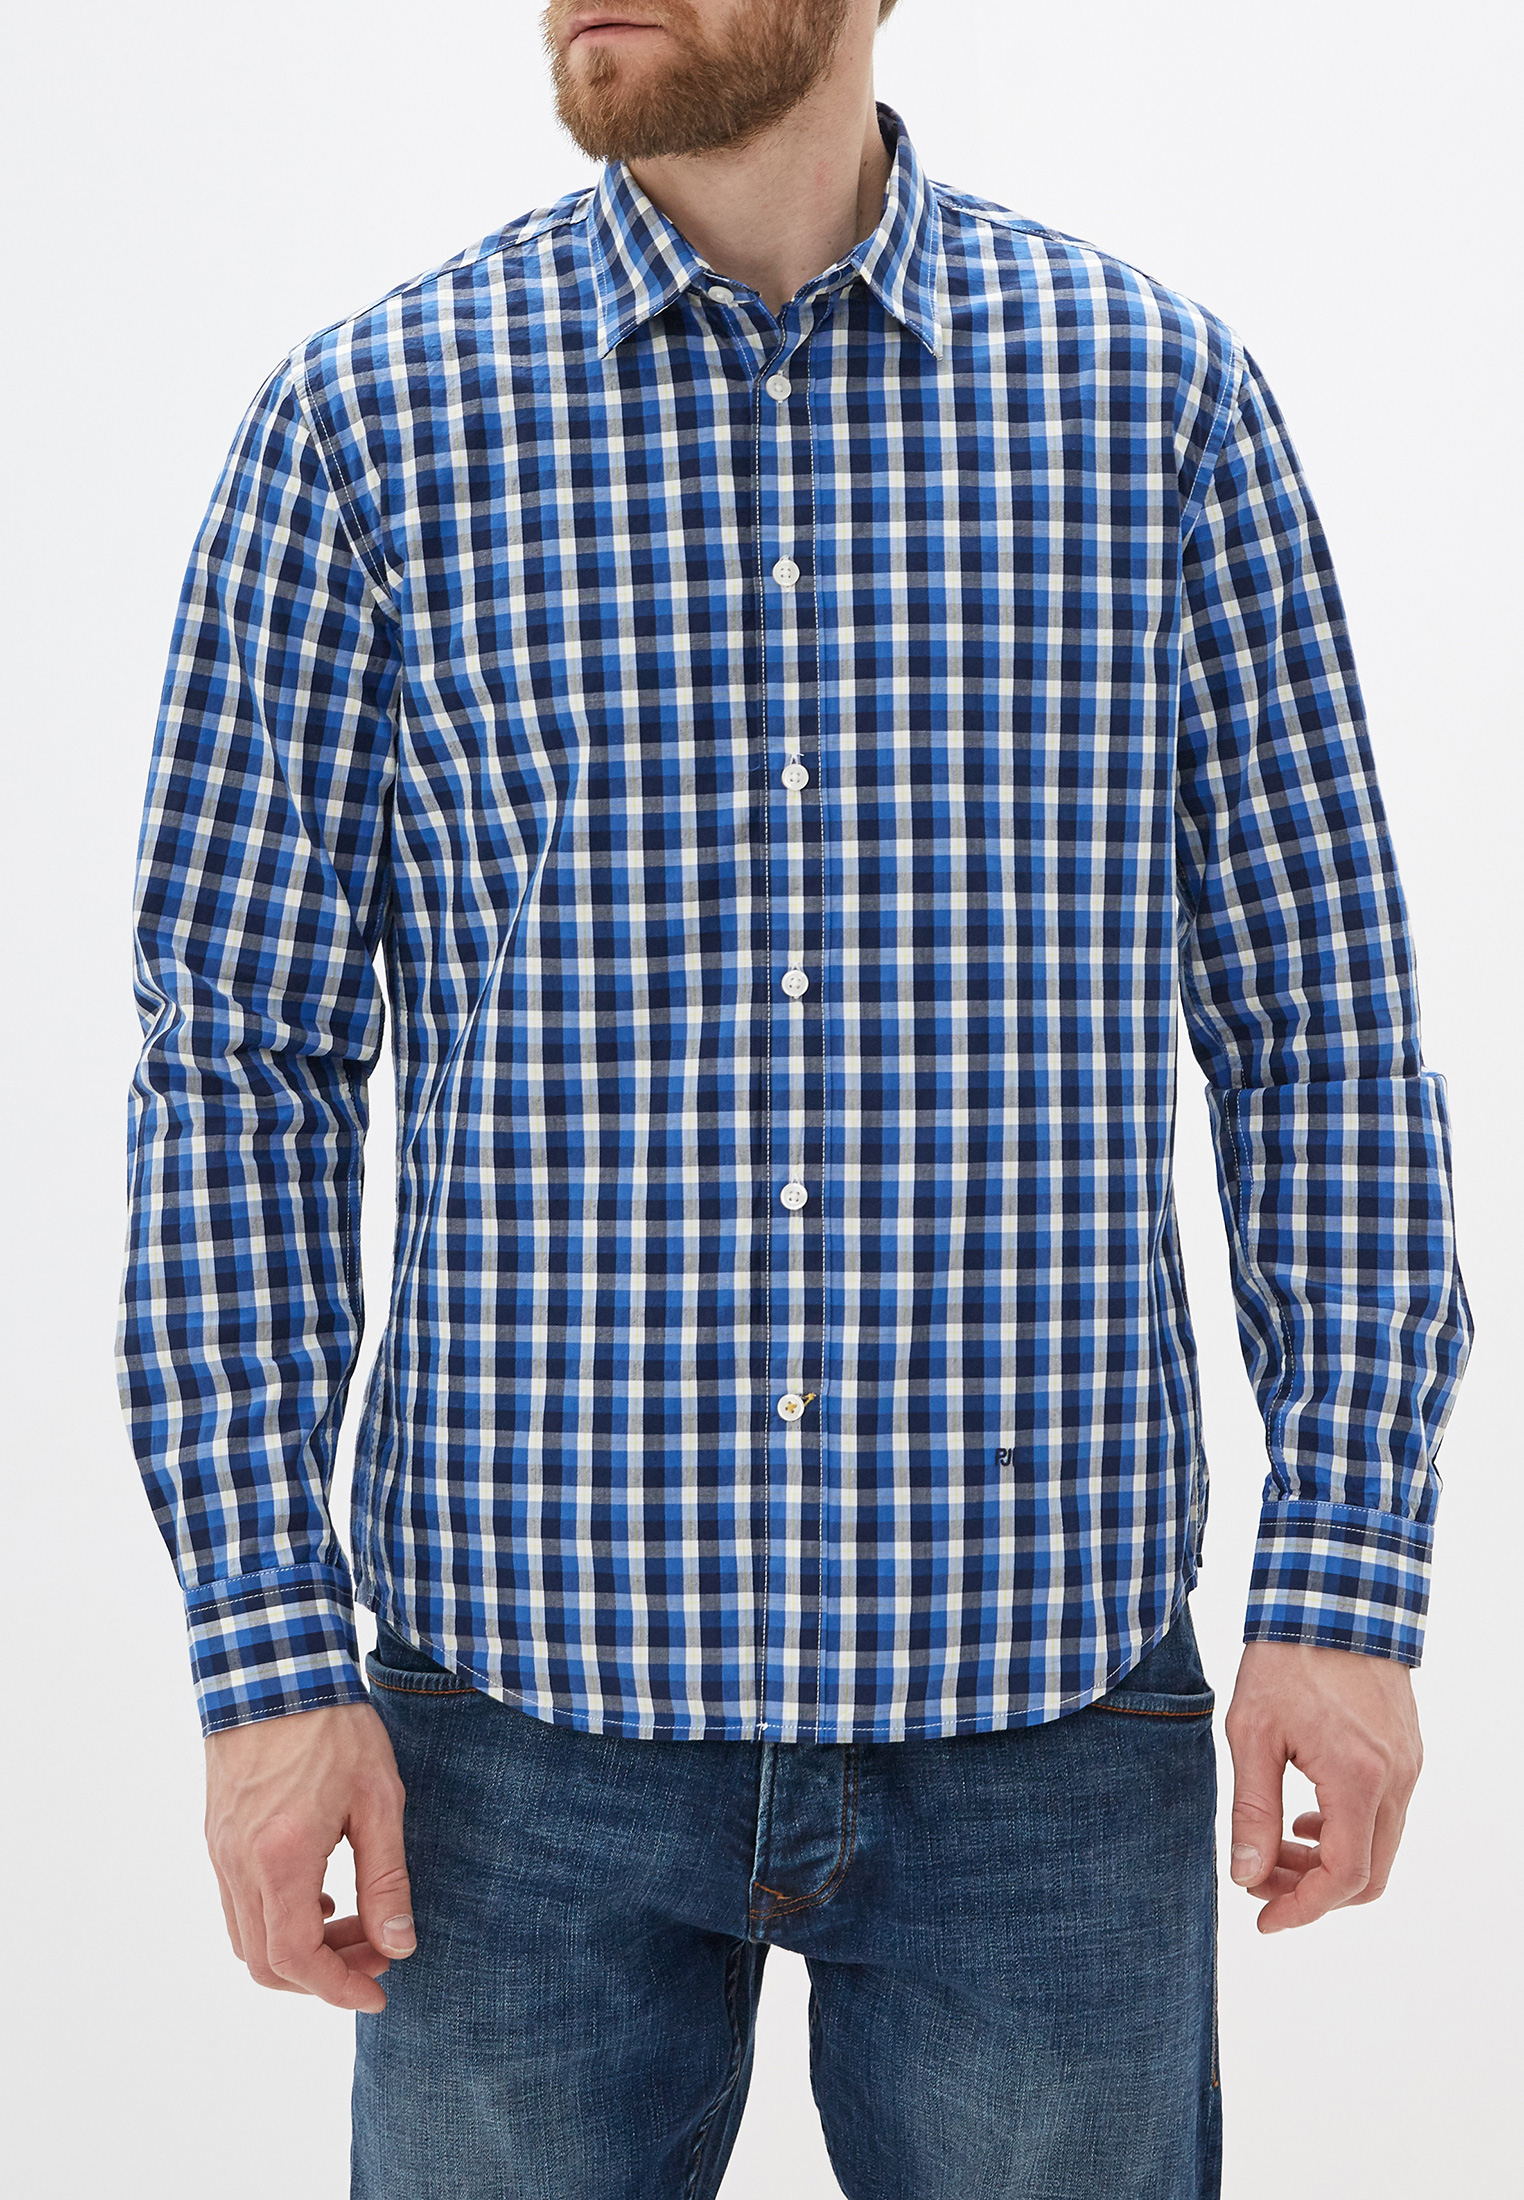 Рубашка с длинным рукавом Pepe Jeans (Пепе Джинс) PM306118